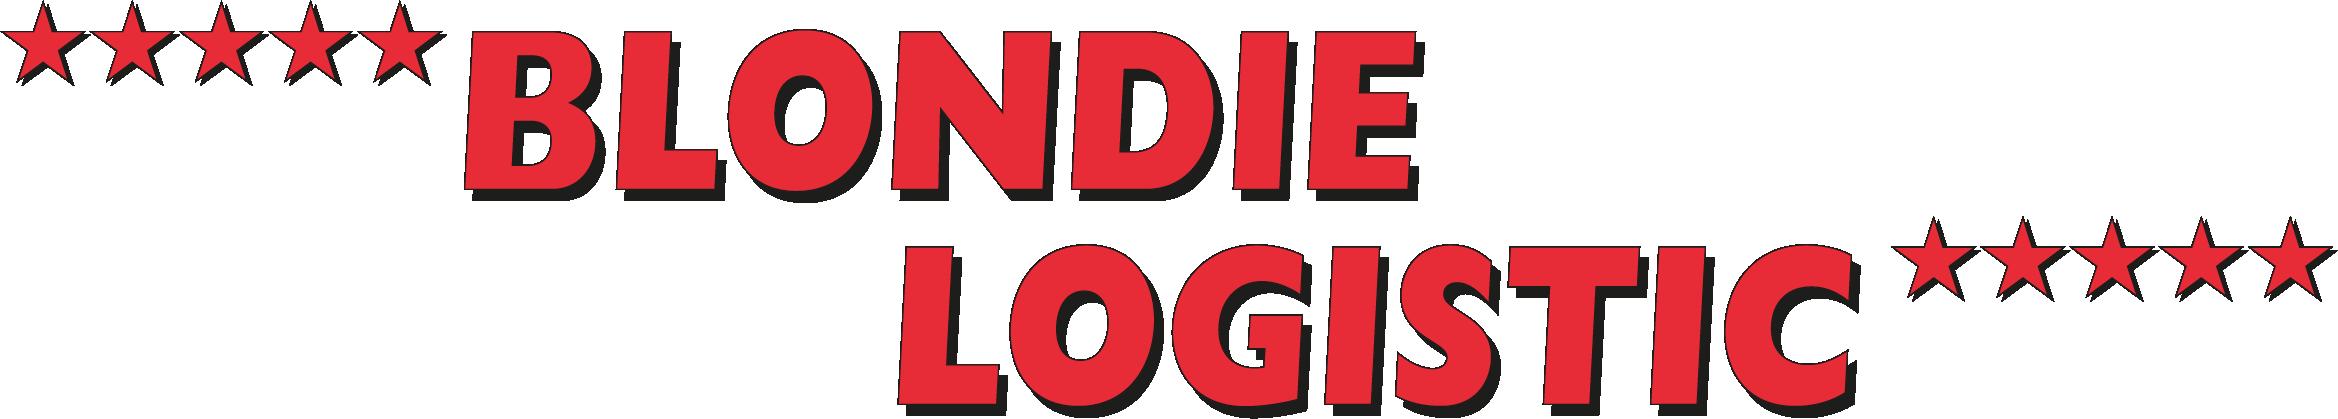 Blondie Logistics